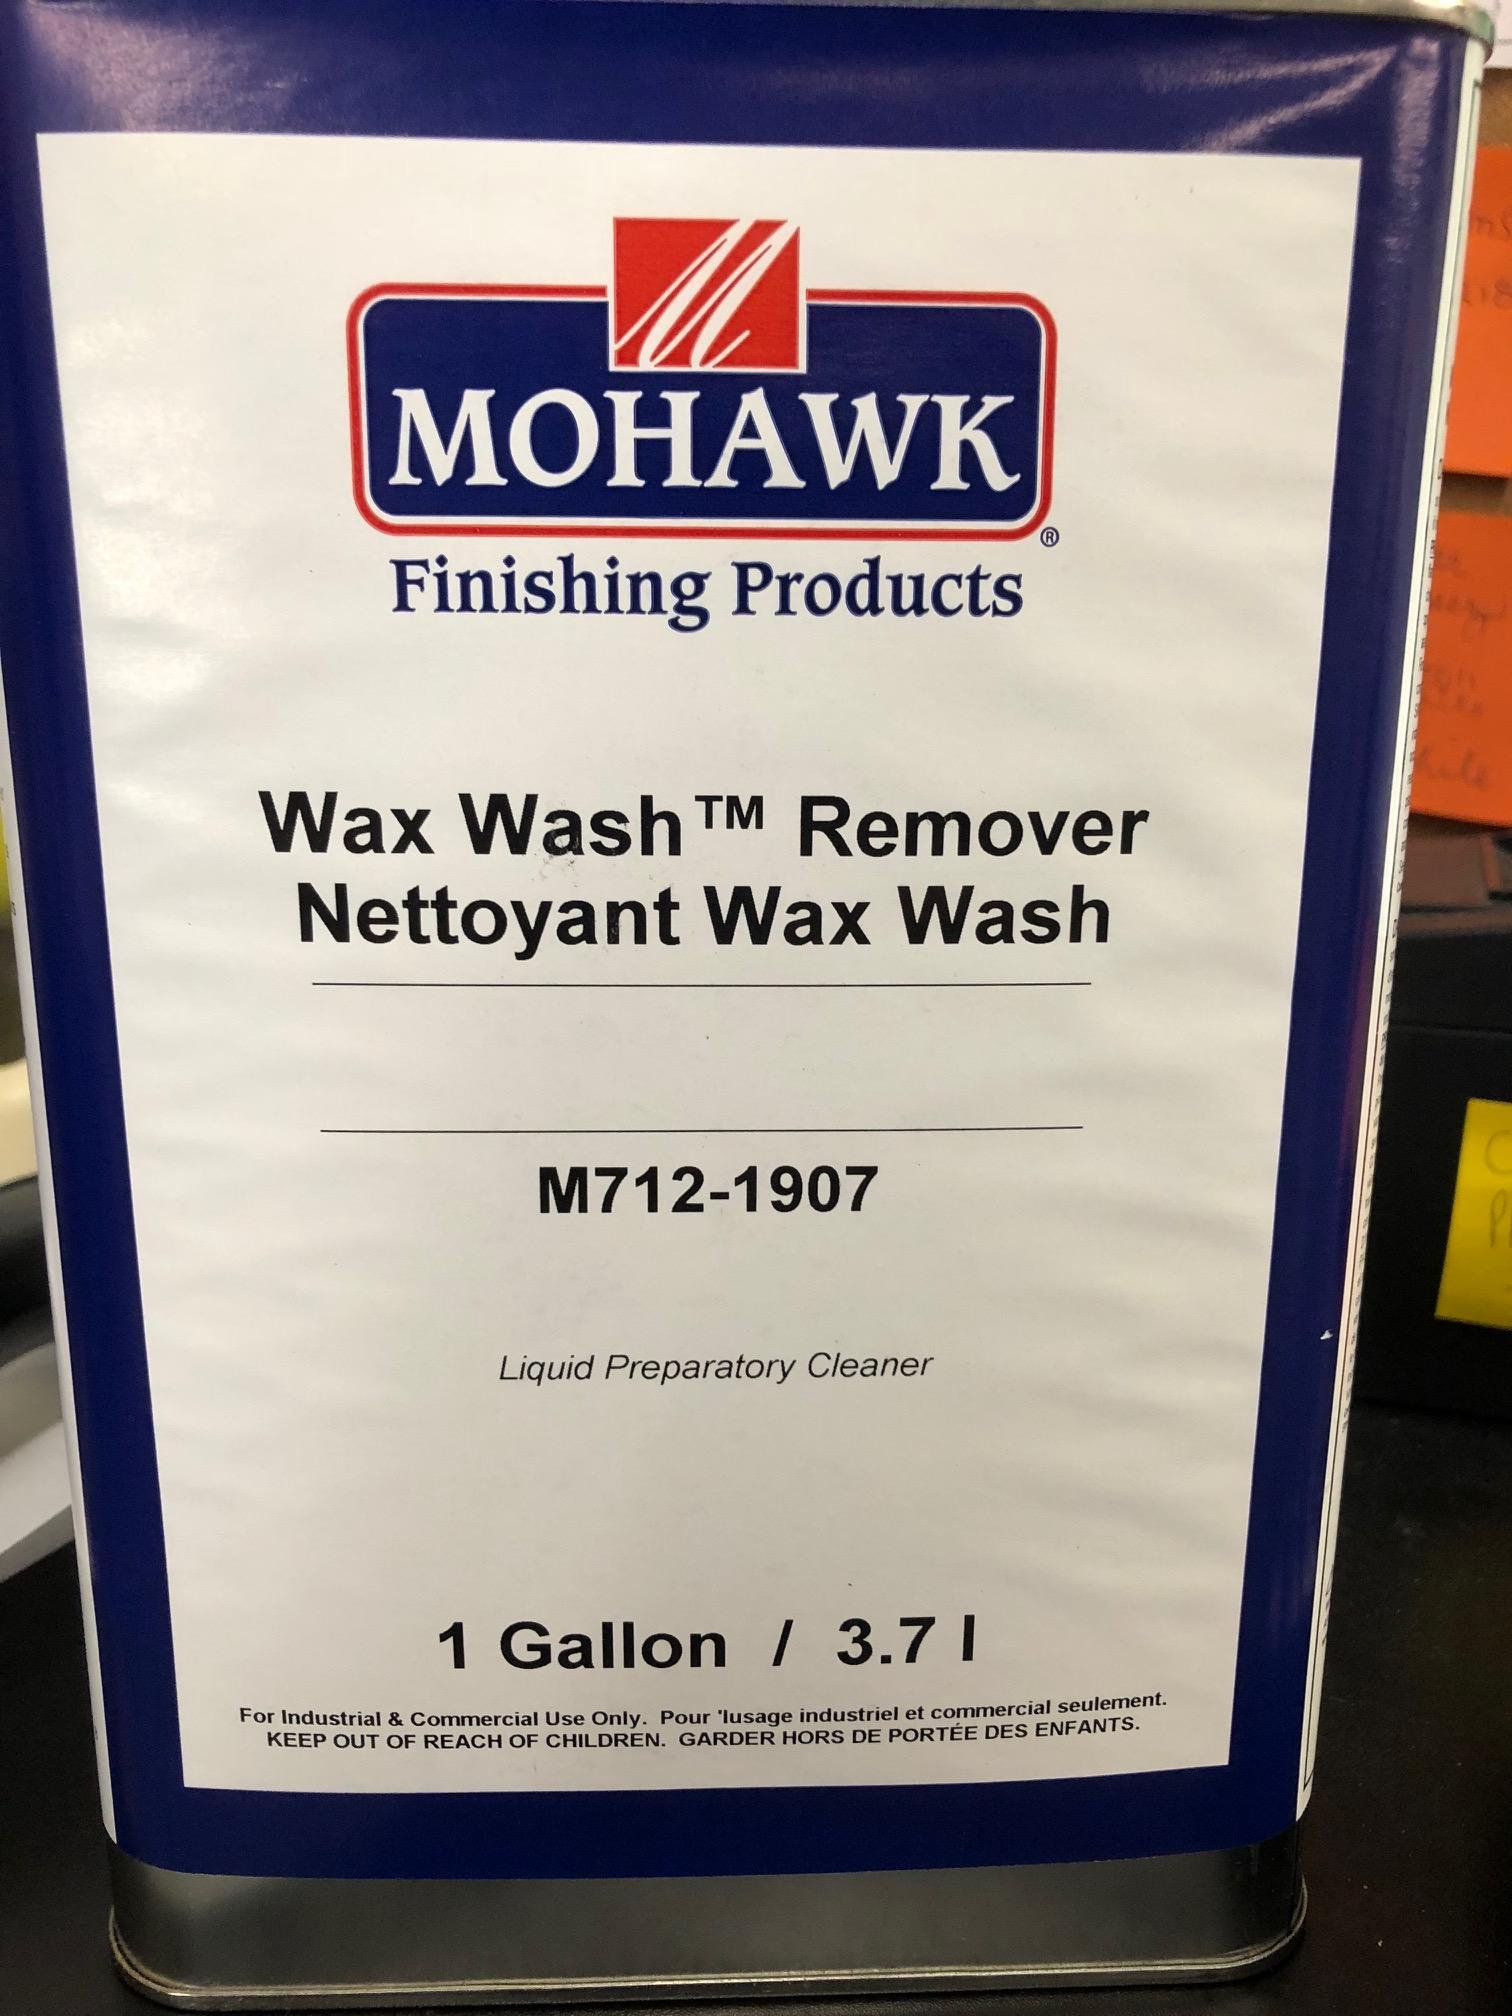 Wax Wash Remover by Mohawk Wax Wash